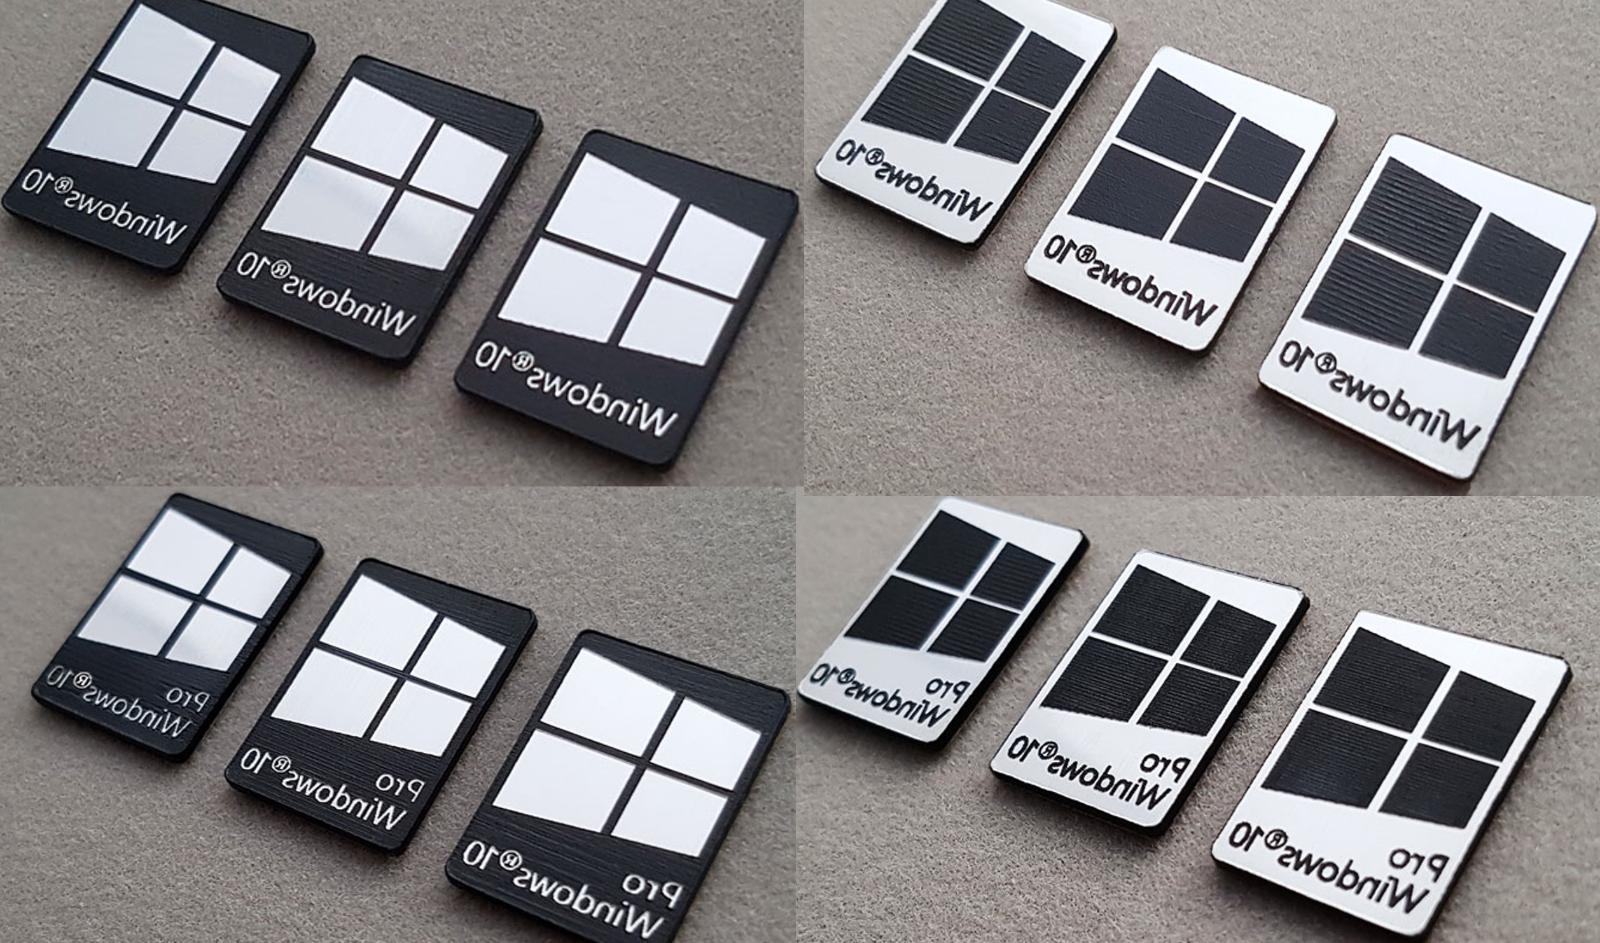 Windows 10 & Pro Metal Silver/Gold/Black Sticker Laptop - Colors